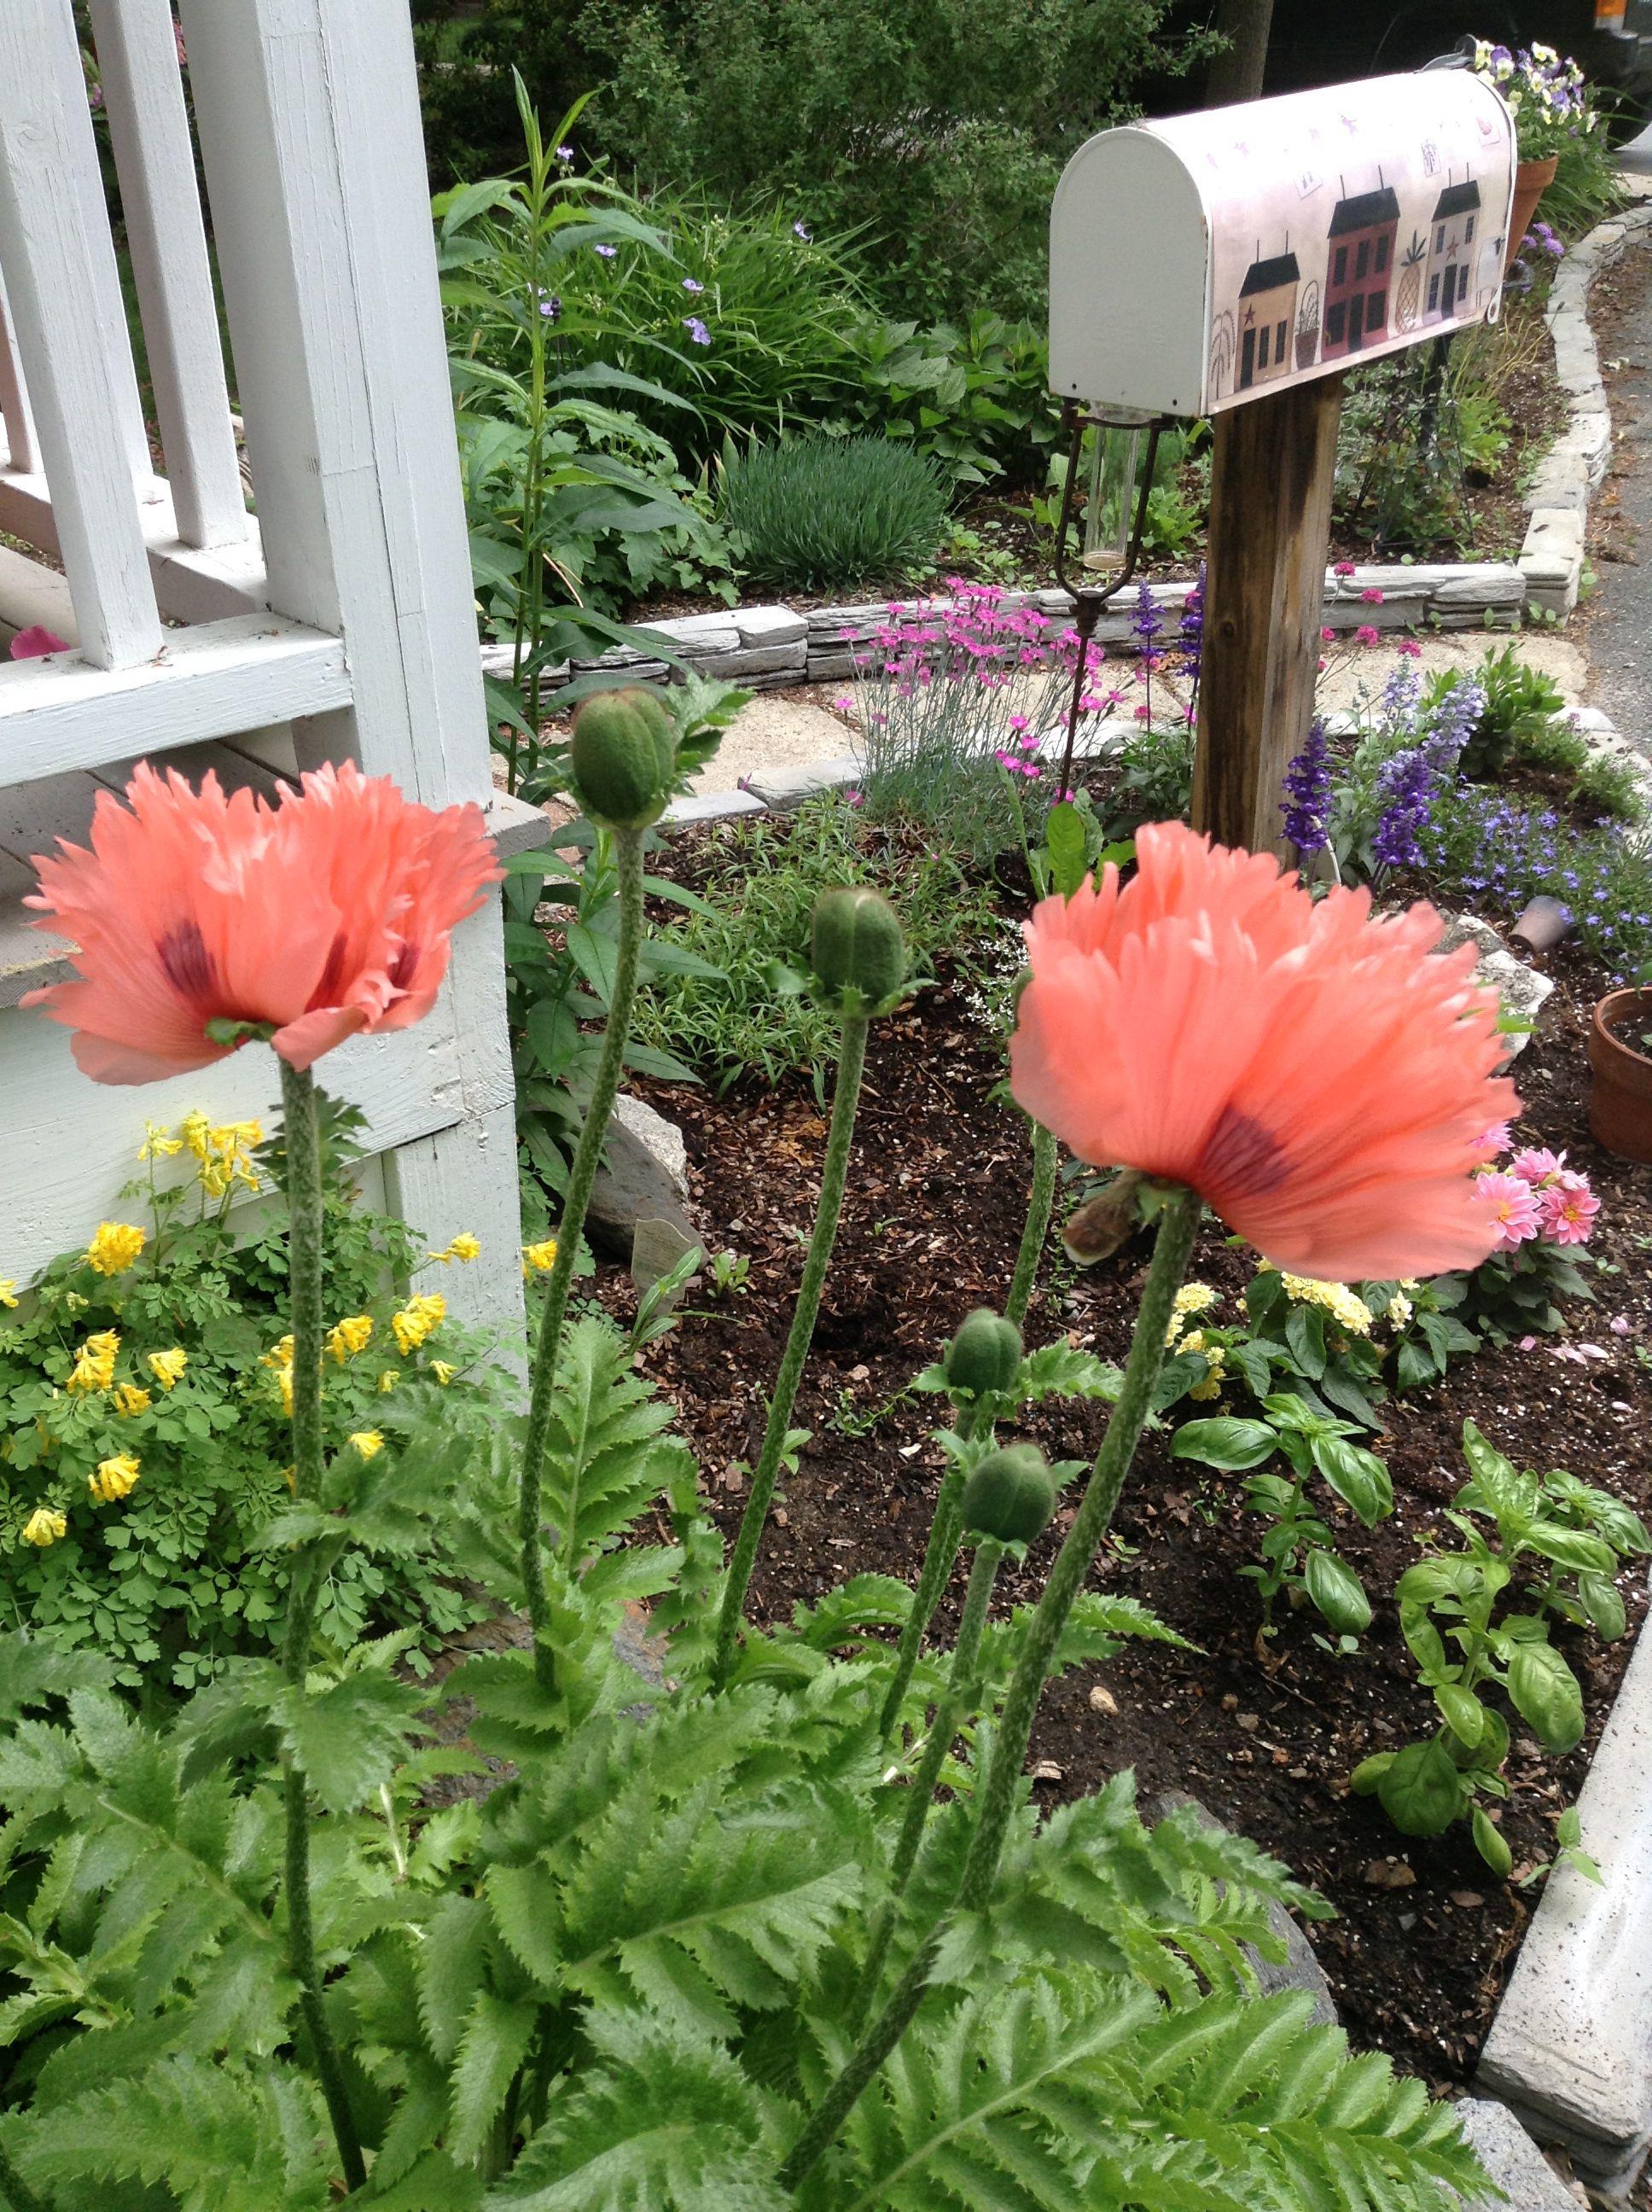 poppies in bloom in early June